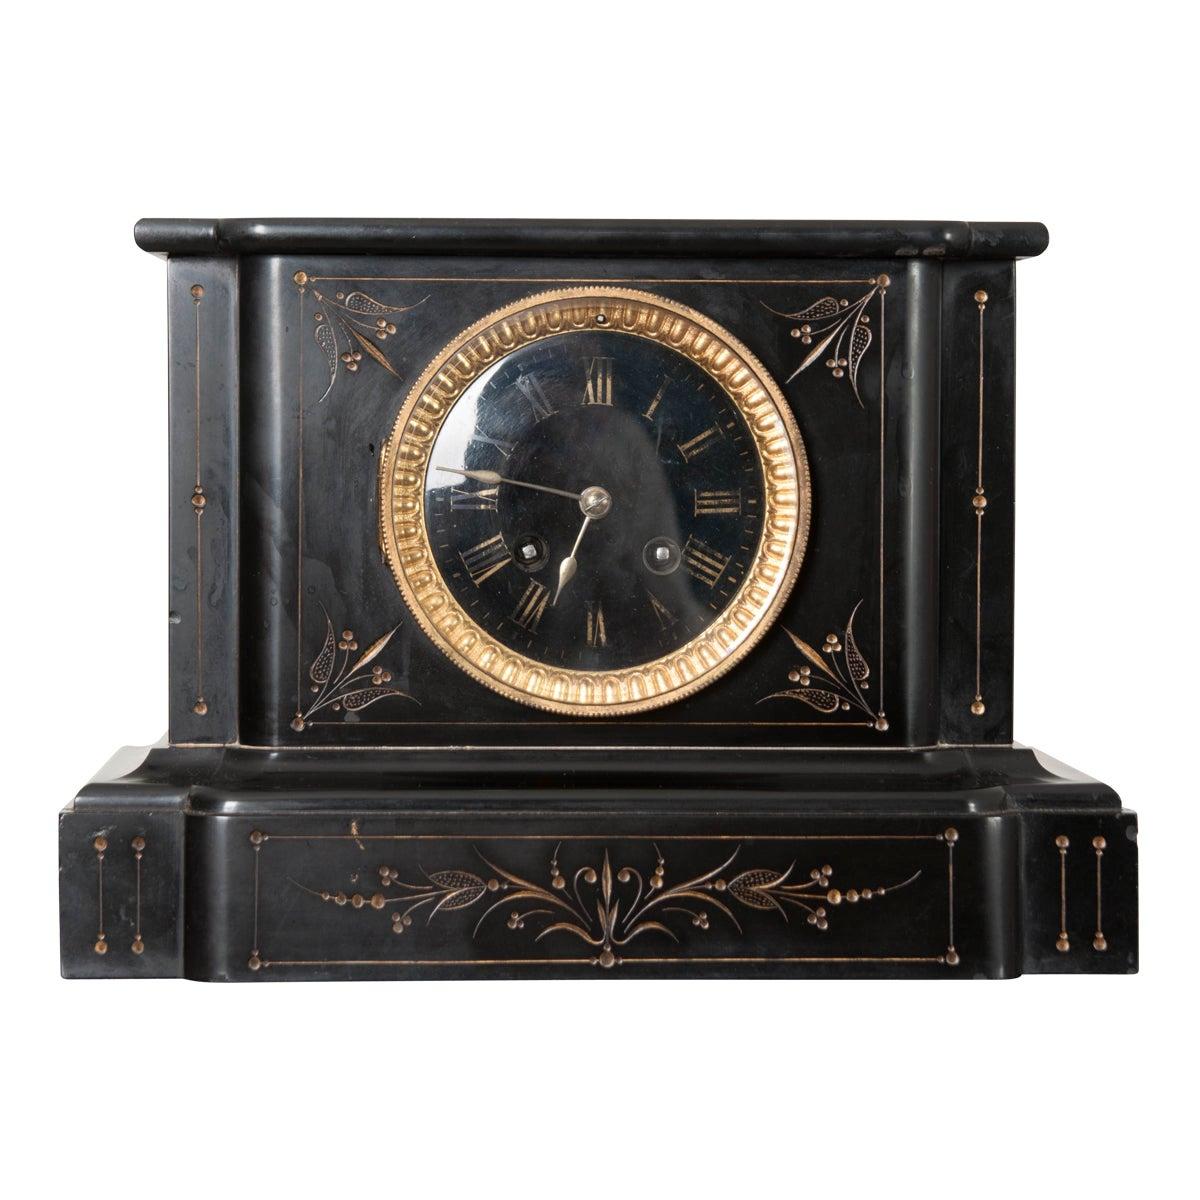 French 19th Century Paris Movement Mantel Clock